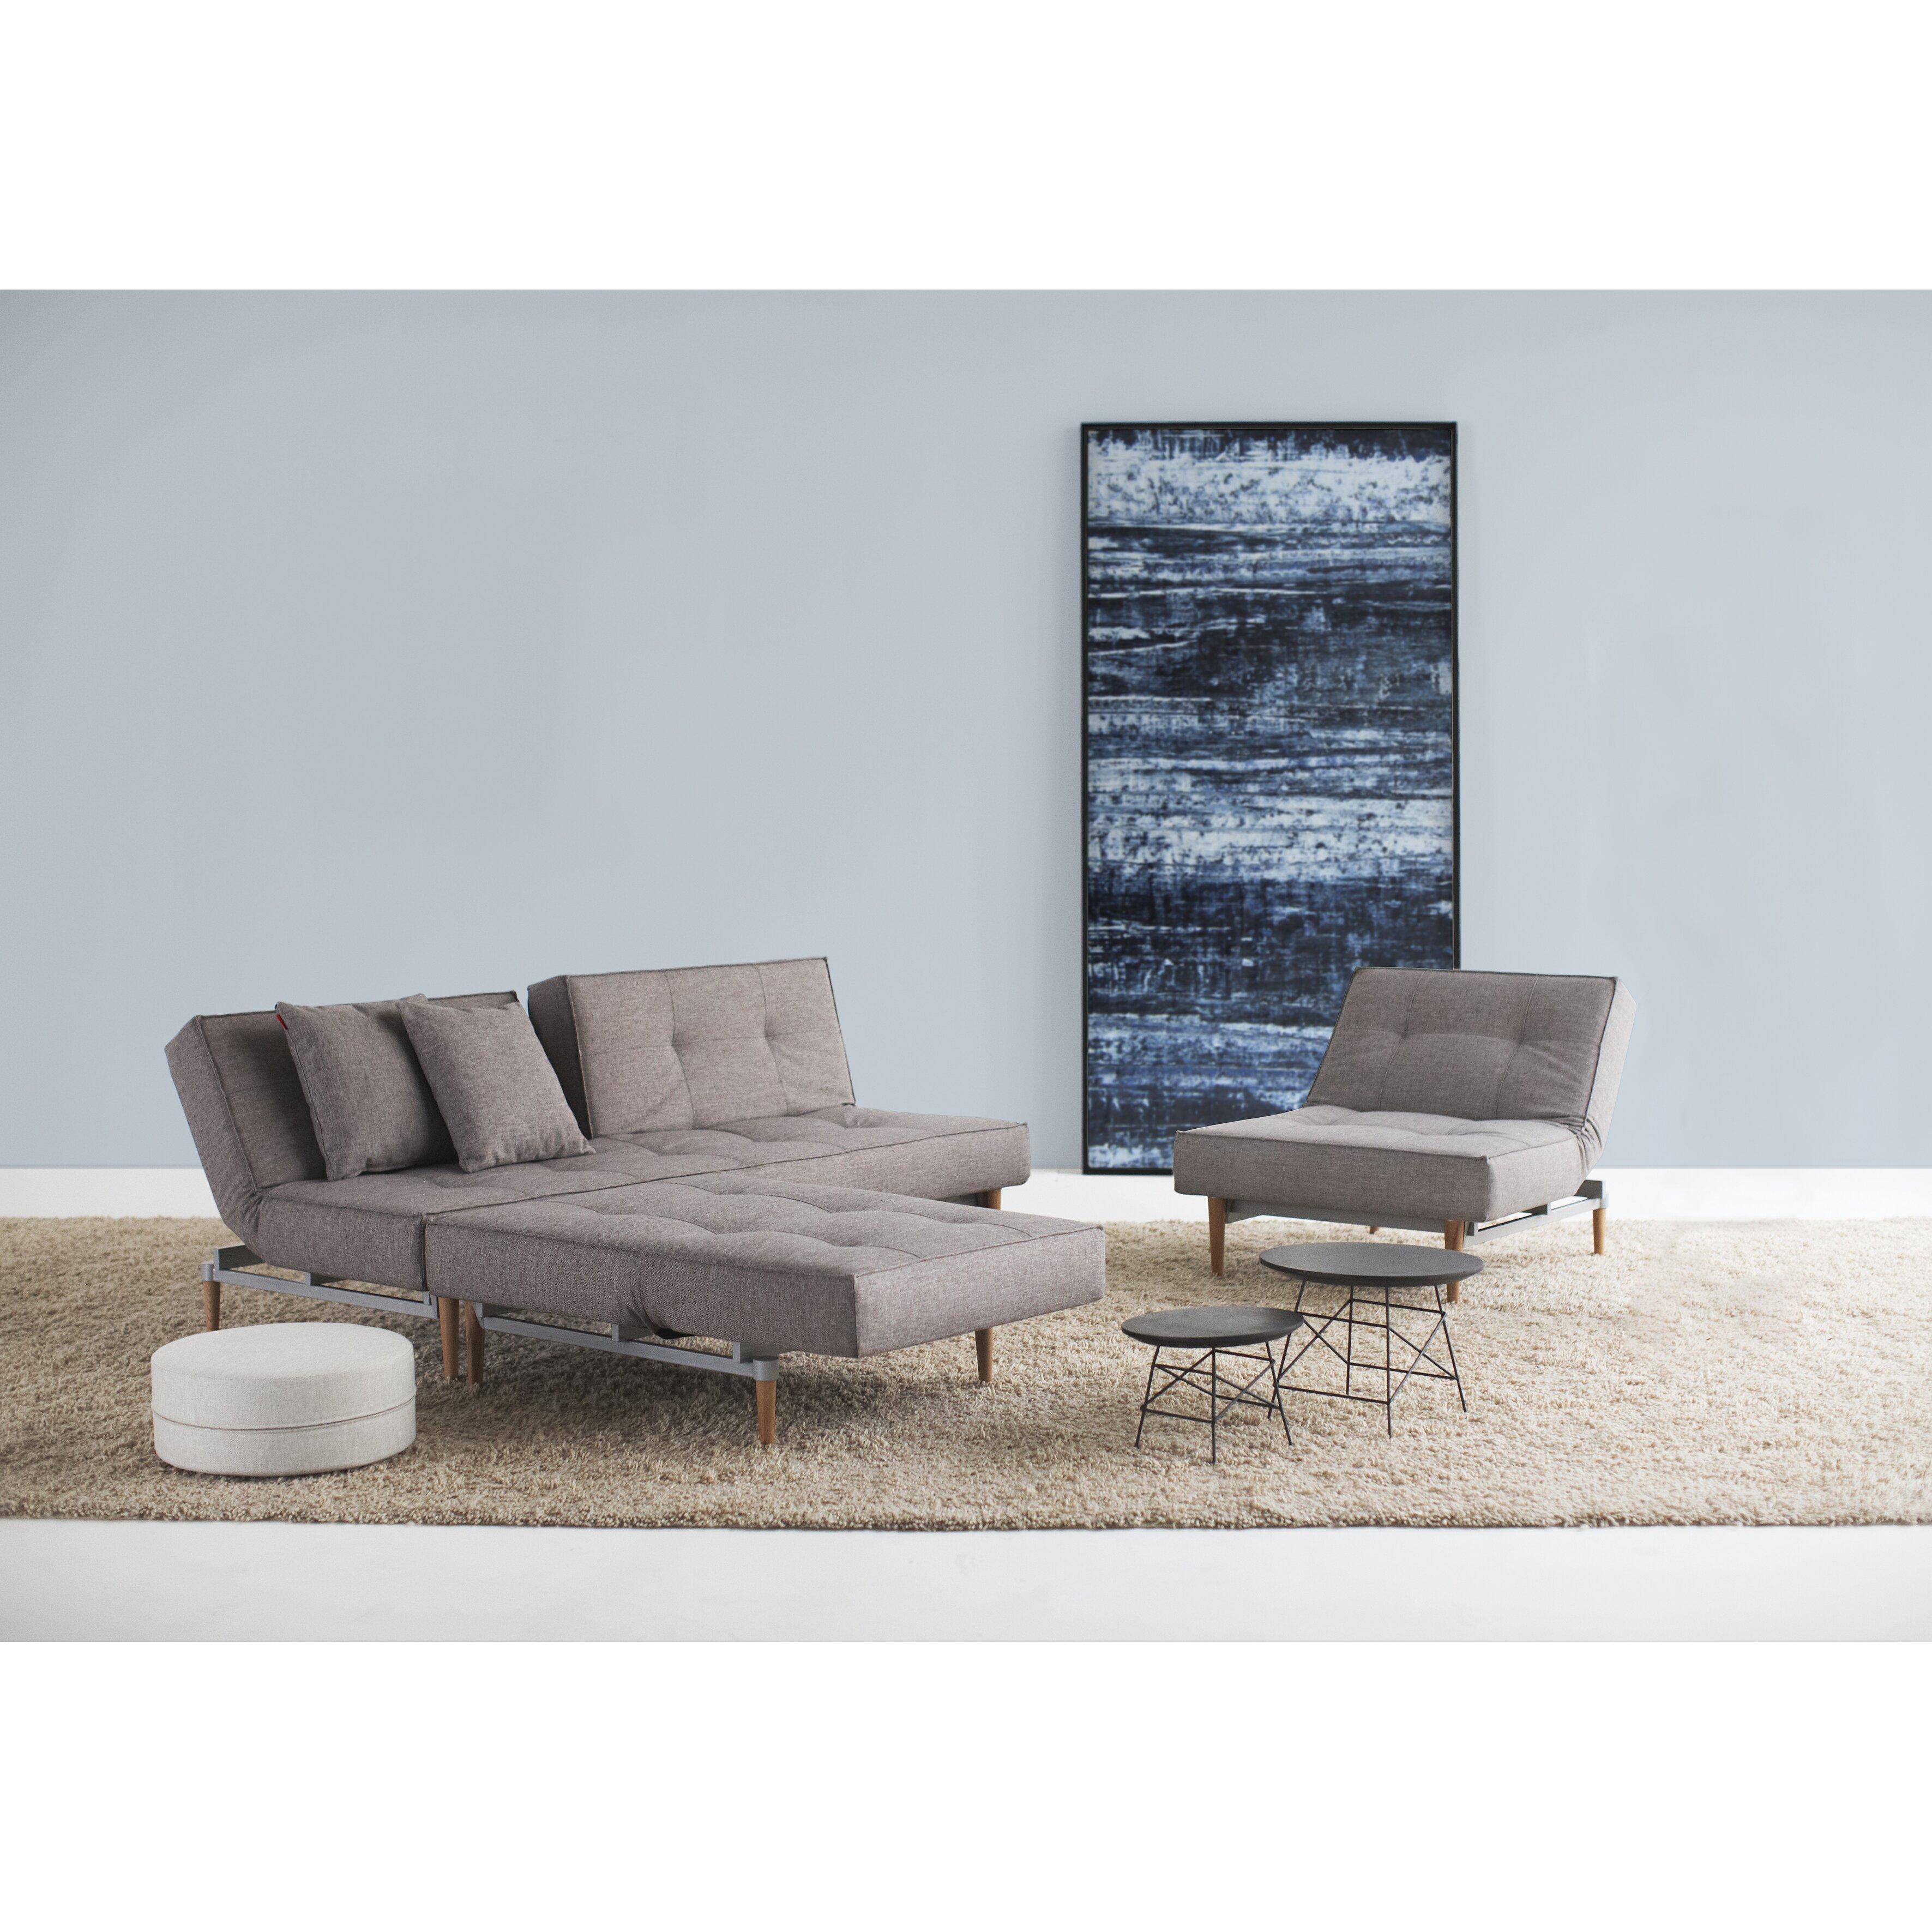 innovation living inc split back sleeper sofa reviews wayfair. Black Bedroom Furniture Sets. Home Design Ideas